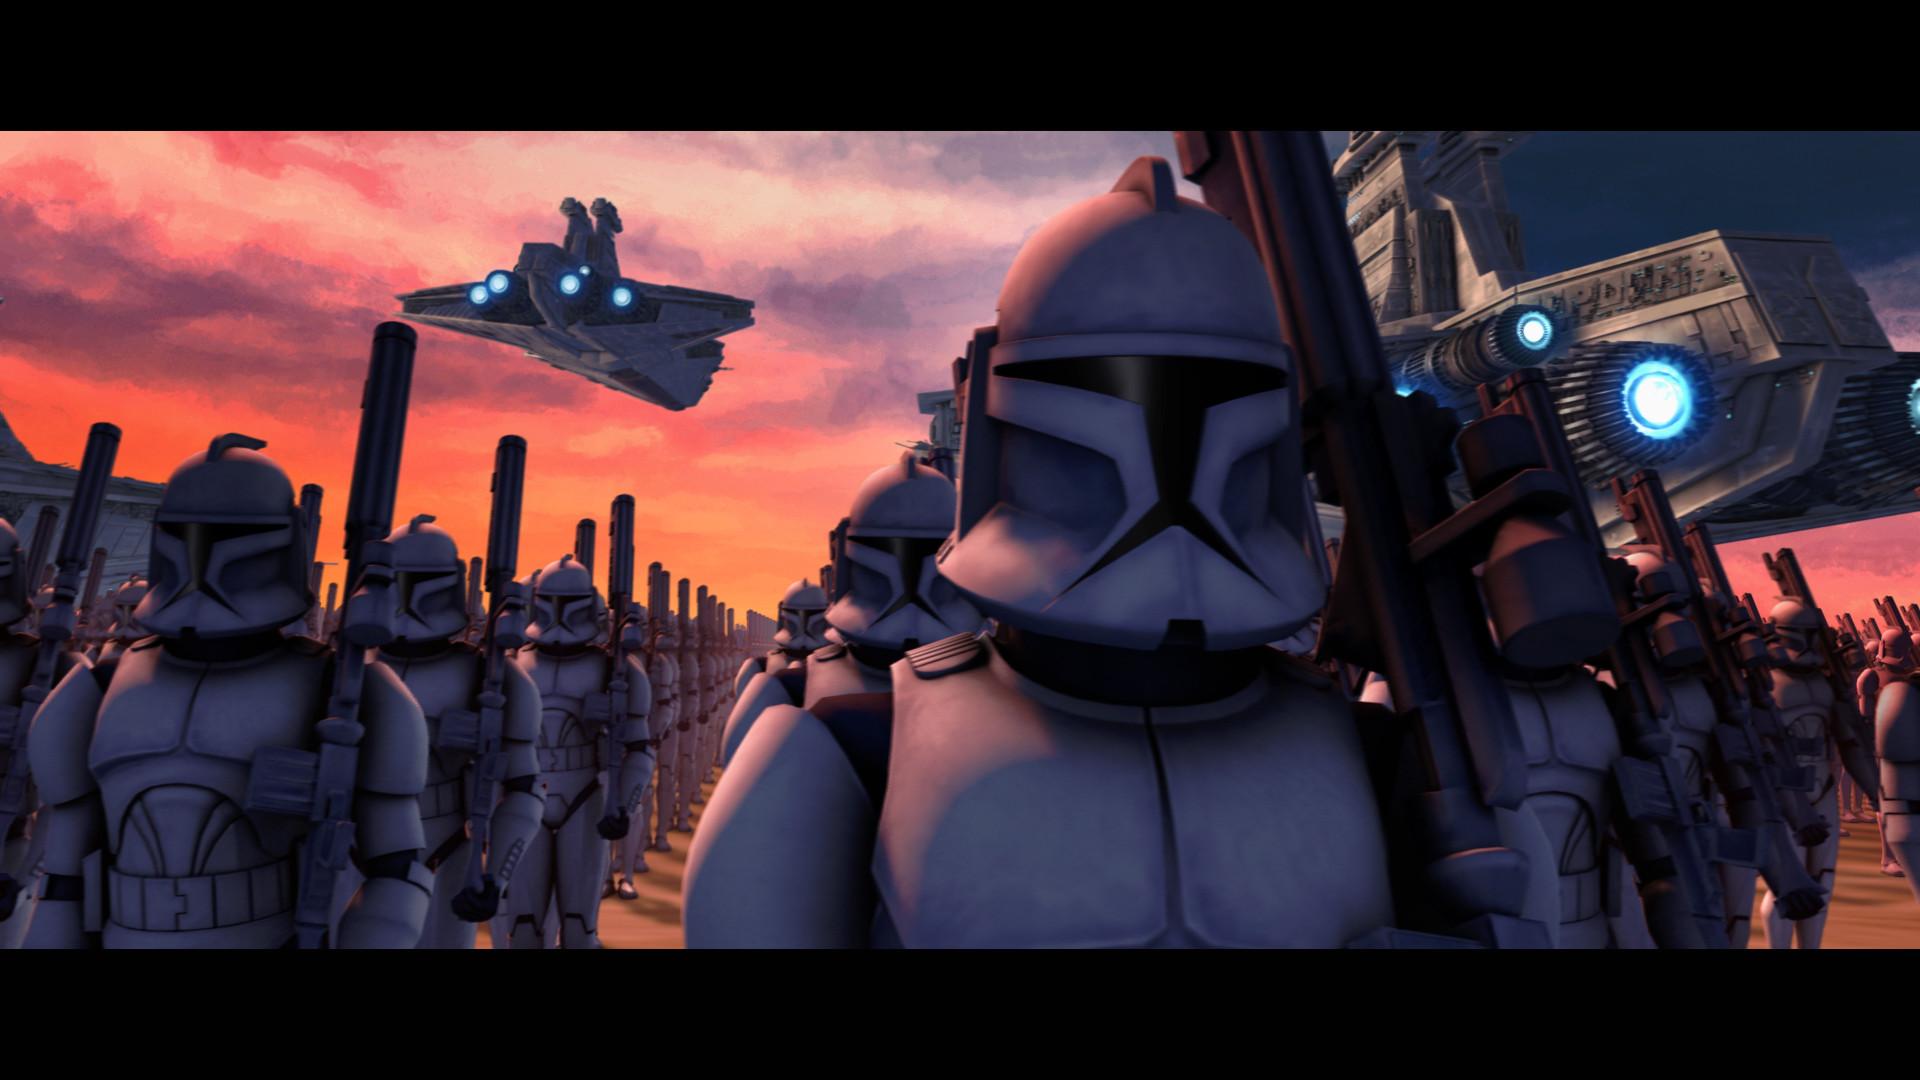 Clone Trooper Wallpaper Wallpapers Browse